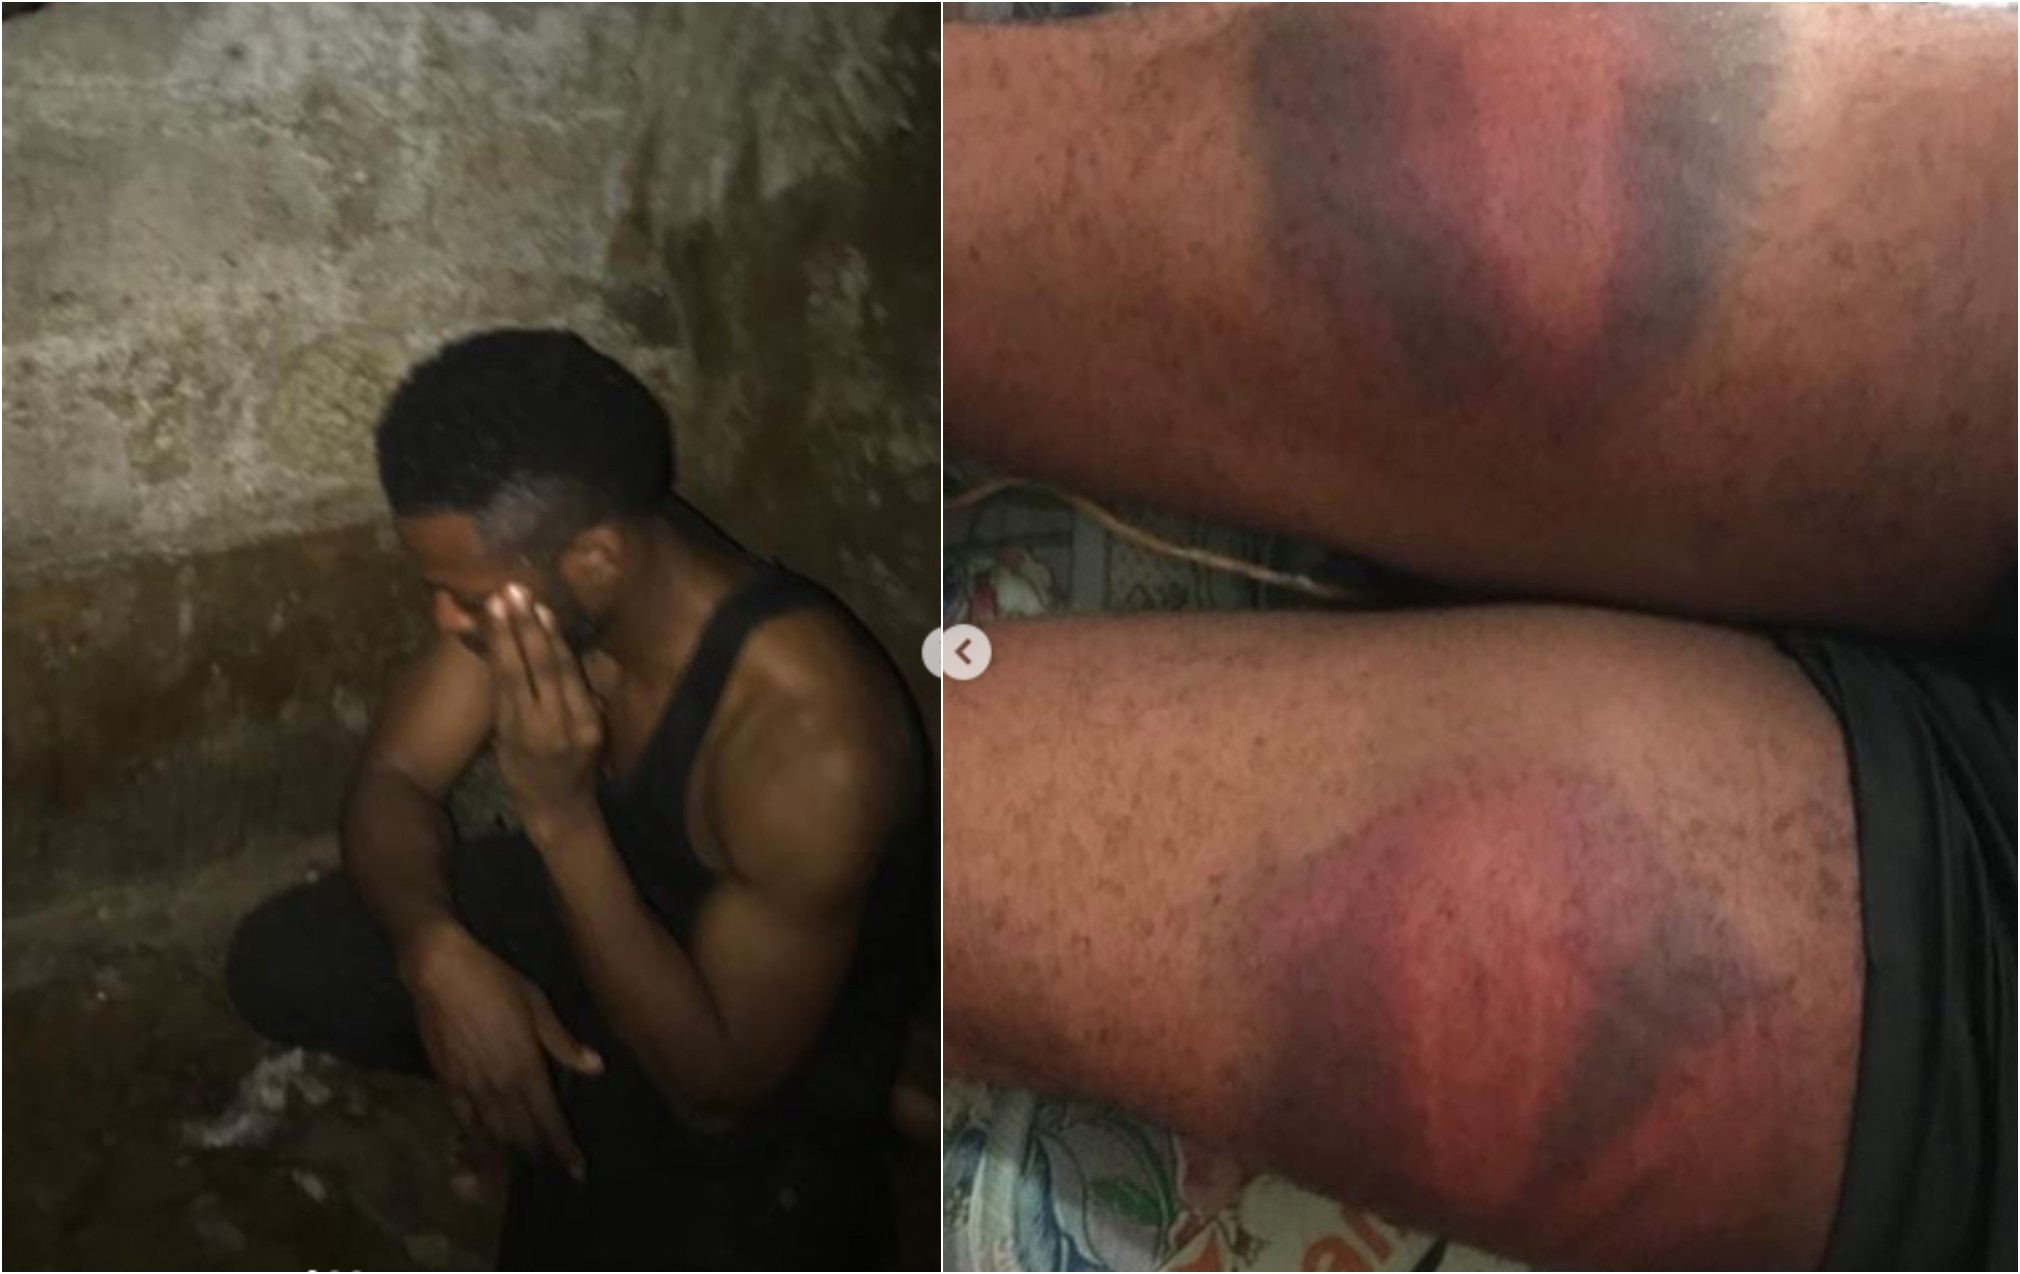 We don't have human rights in Nigeria - Army officer tells UK-based Nigerian businessman he dehumanized lindaikejisblog